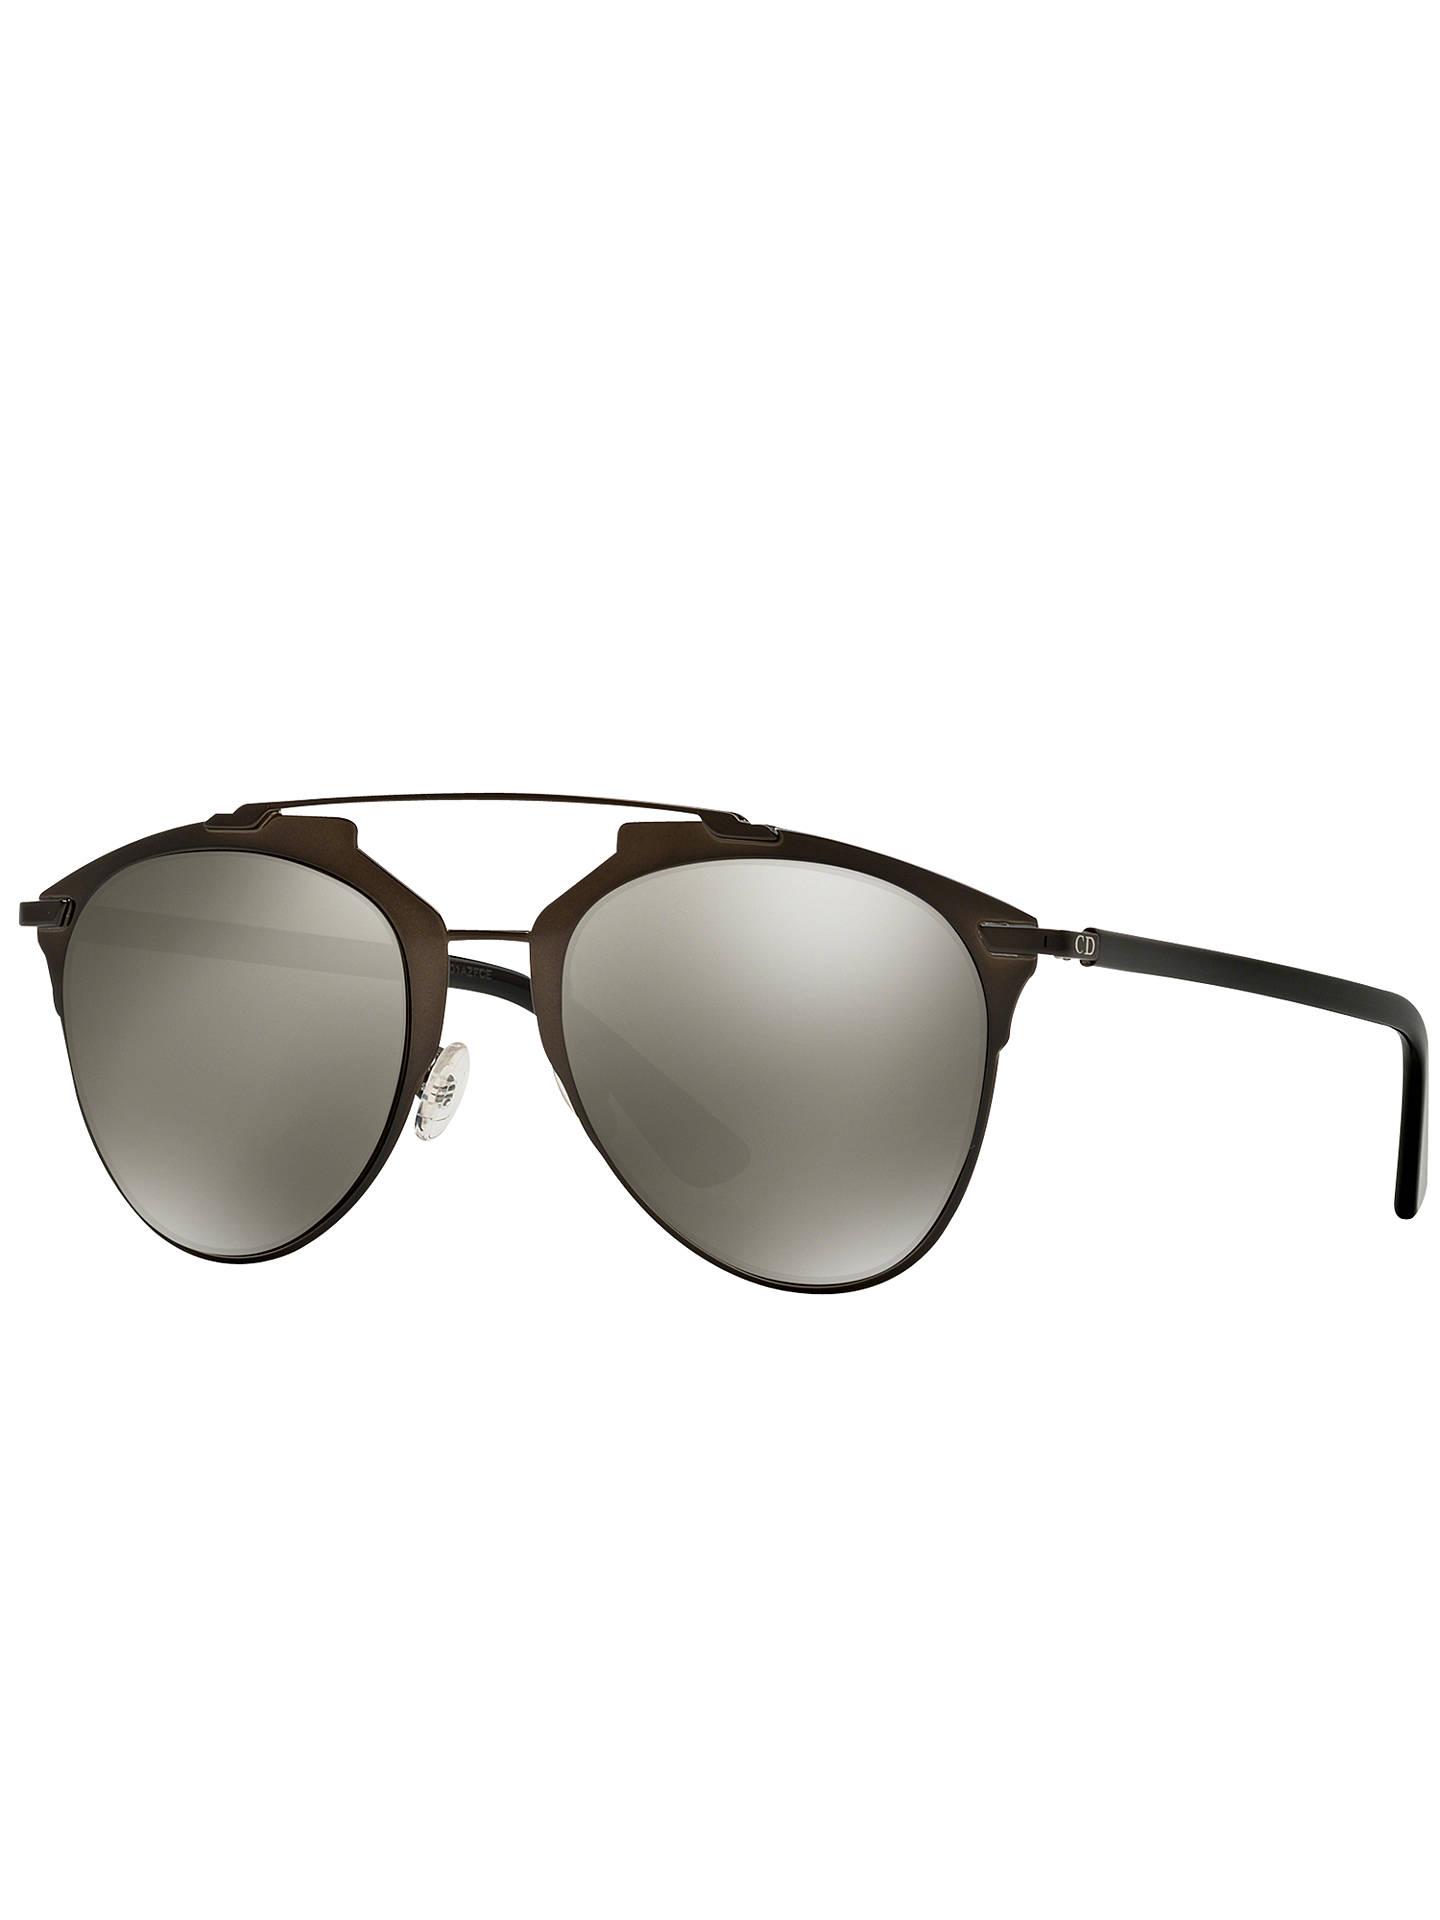 799e7cffd494 Buy Dior CDM2P Reflected Sunglasses